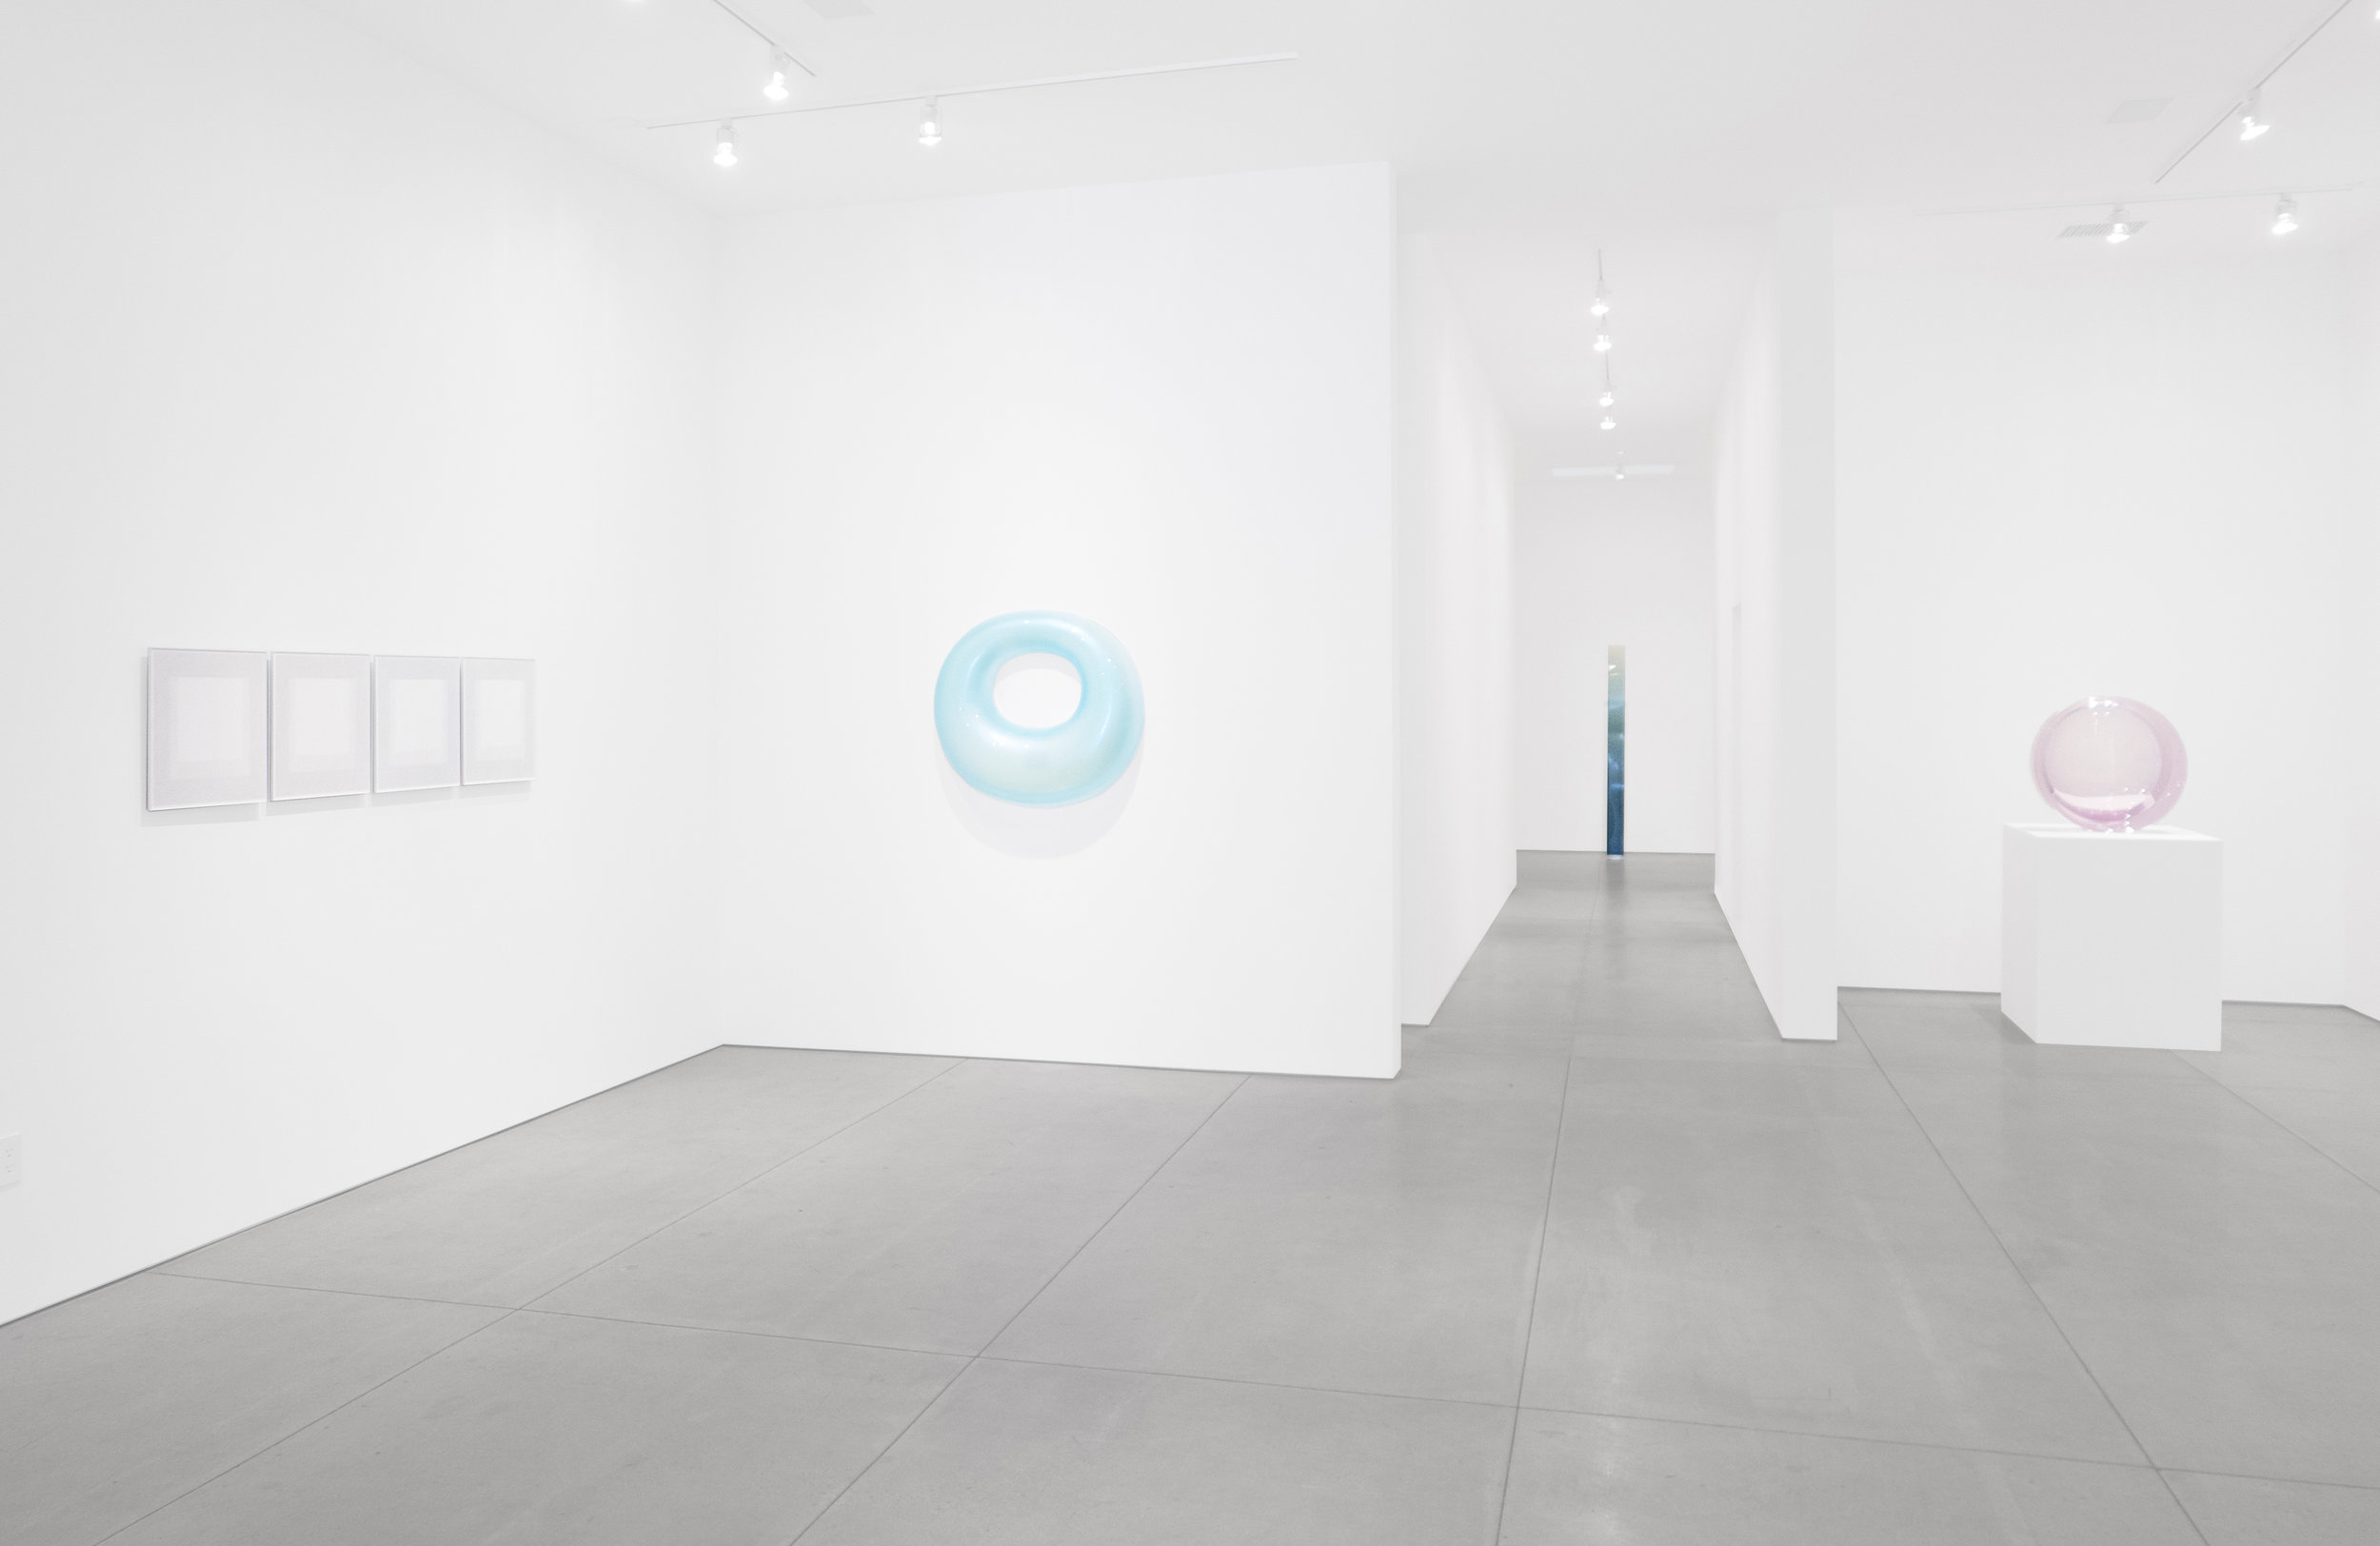 25 Years_Peter Blake Gallery_2019_Installation View_14.jpg